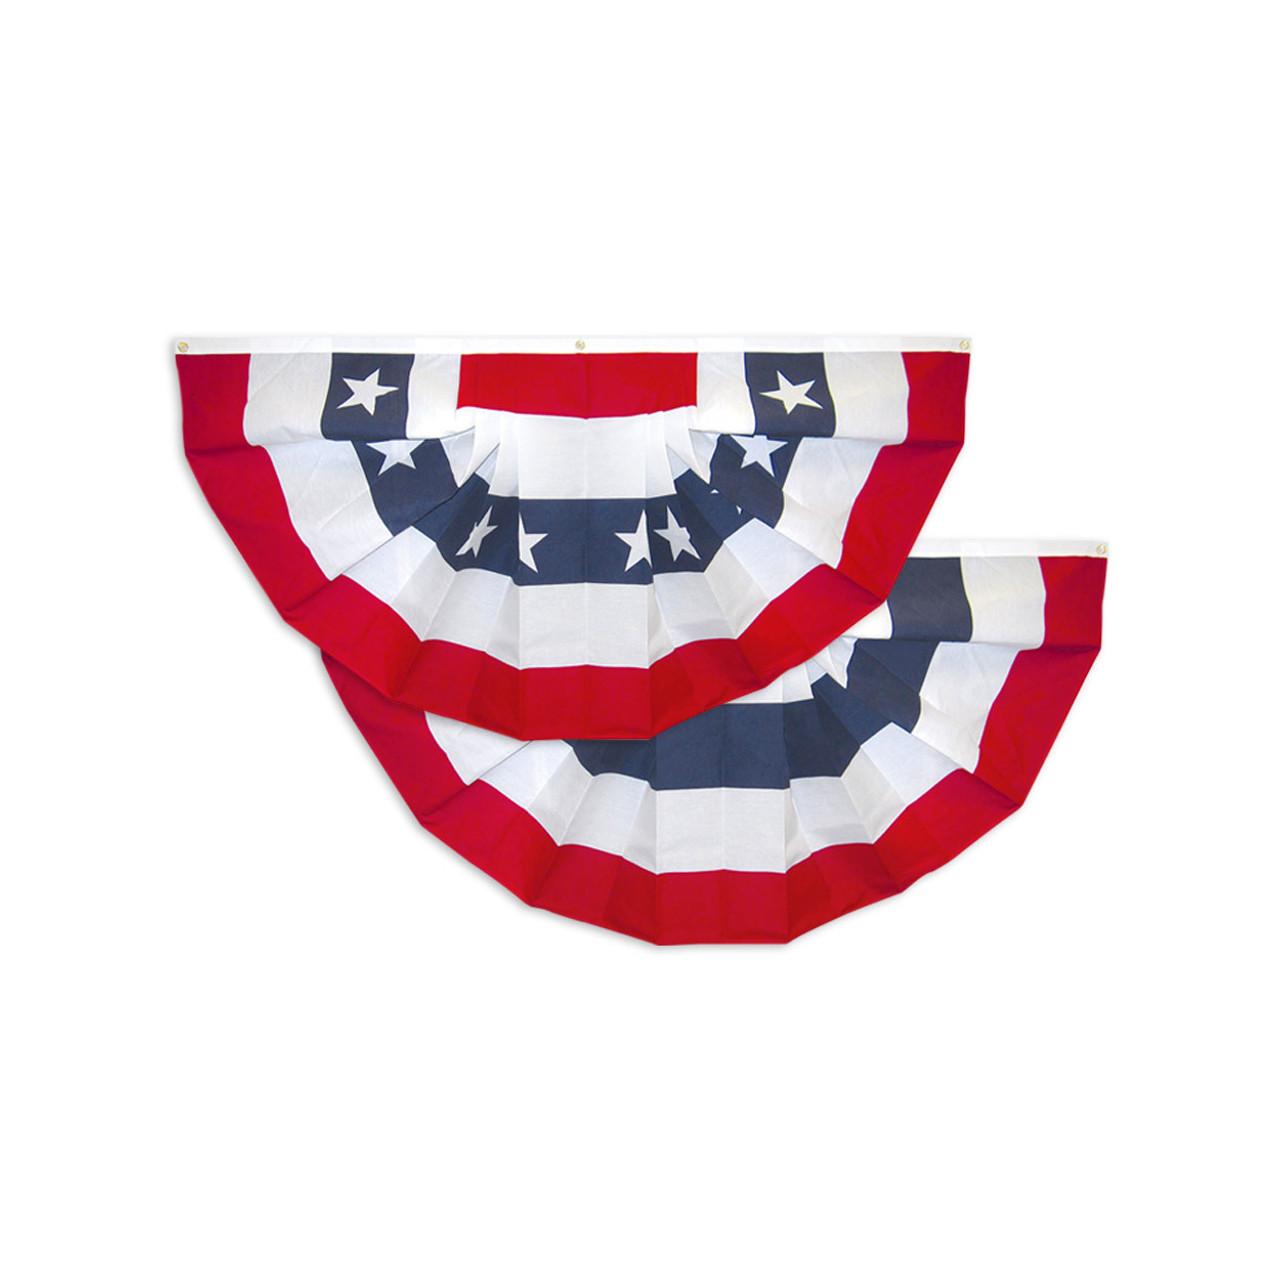 USA Fan, Bunting Decorations